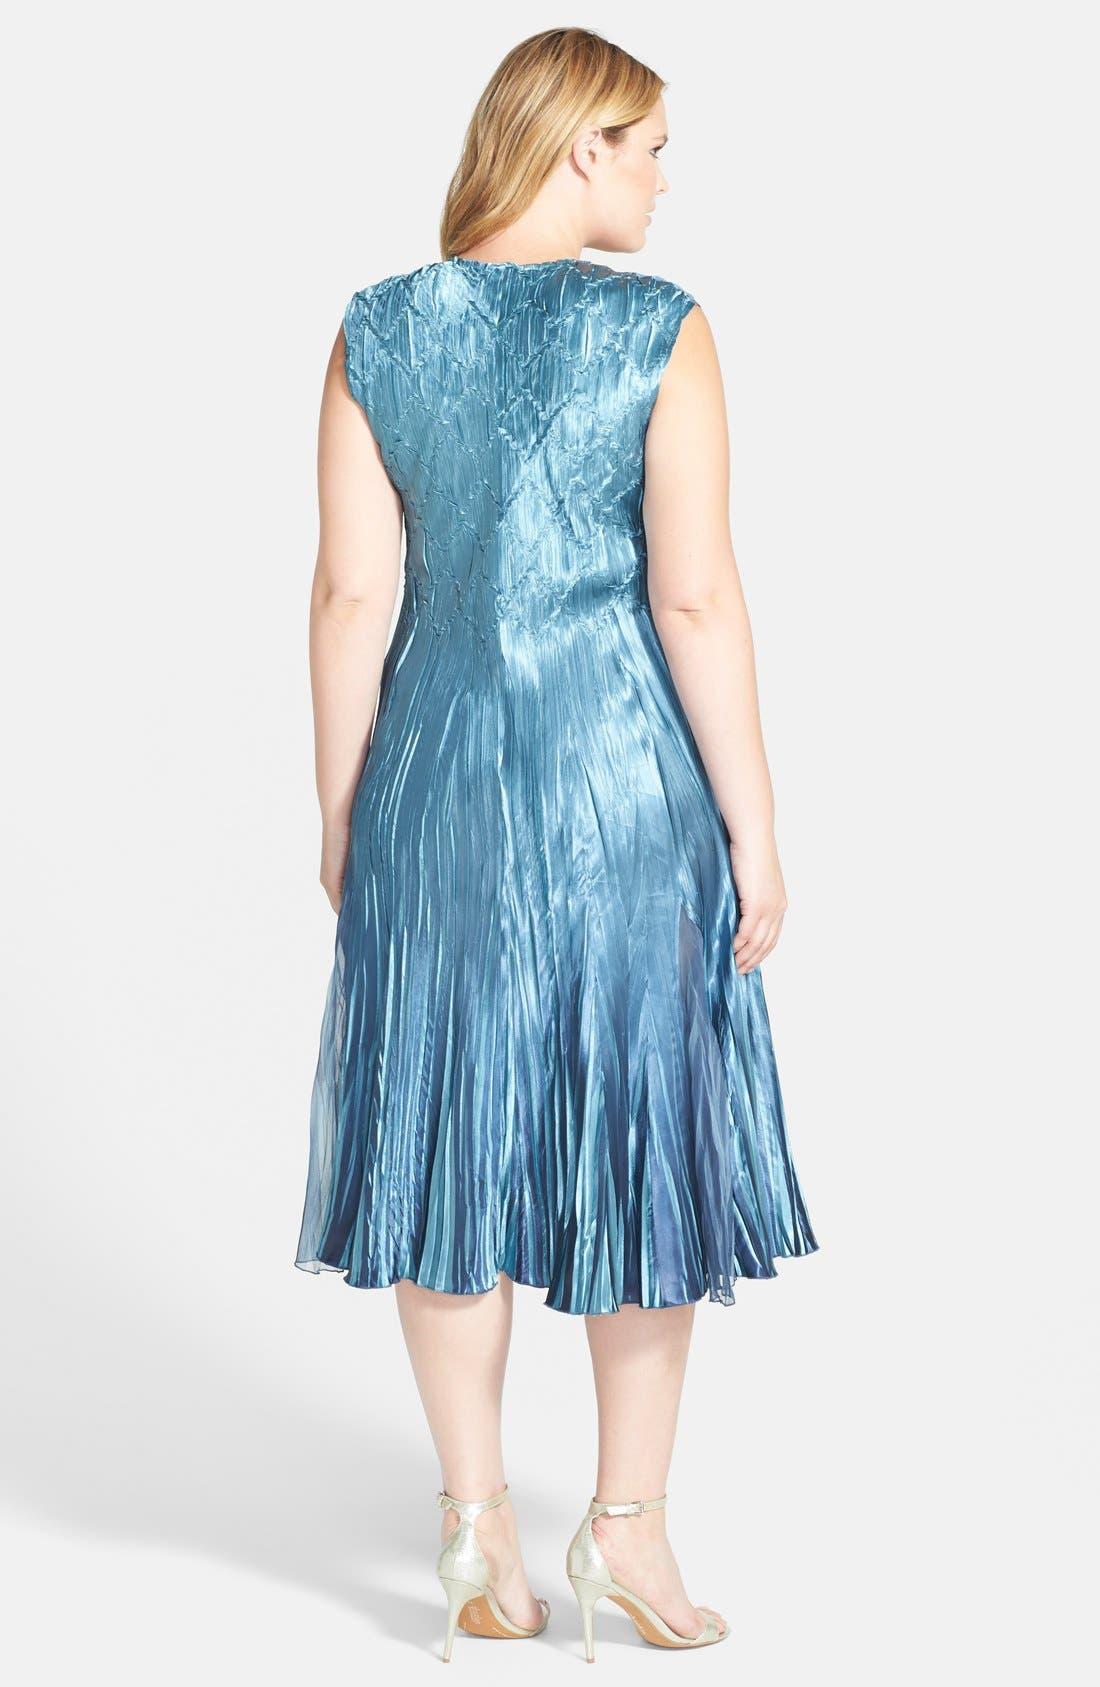 Embellished Charmeuse & Chiffon Dress with Jacket,                             Alternate thumbnail 8, color,                             460